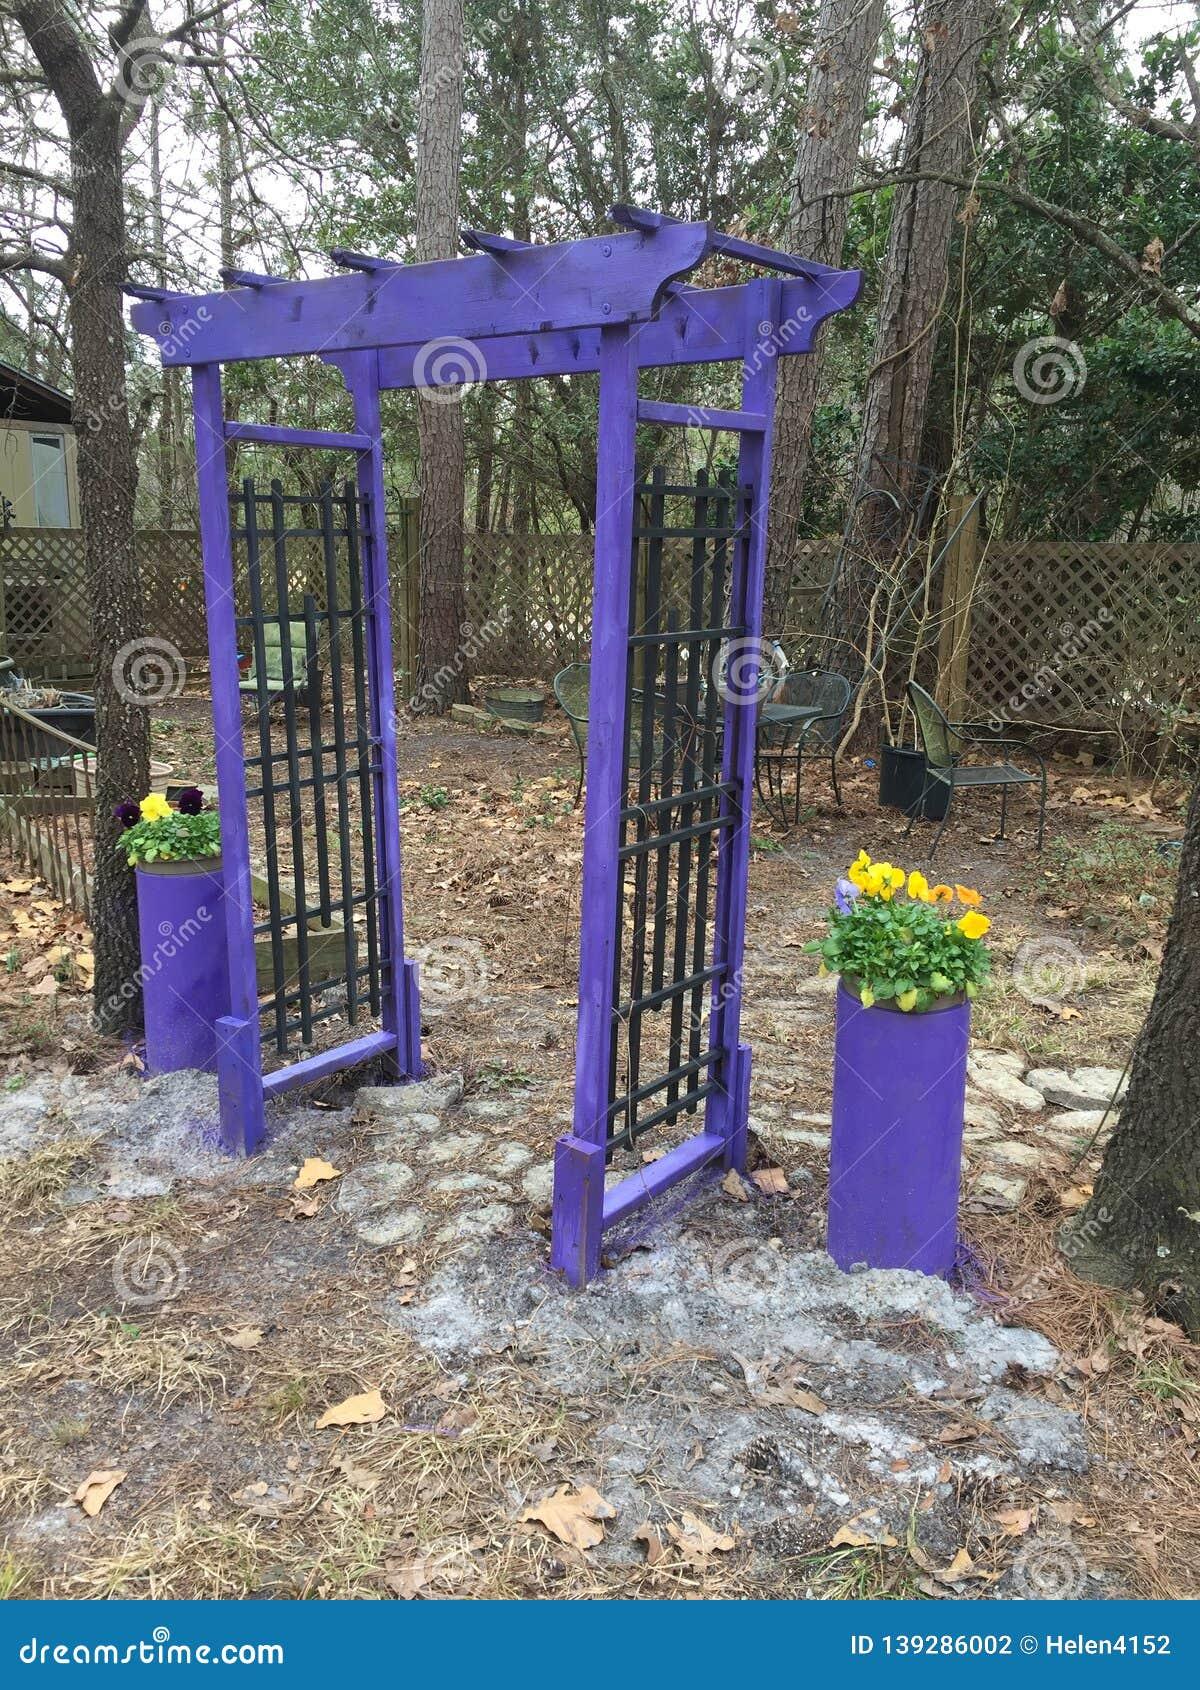 Garden Arch painted Lavender